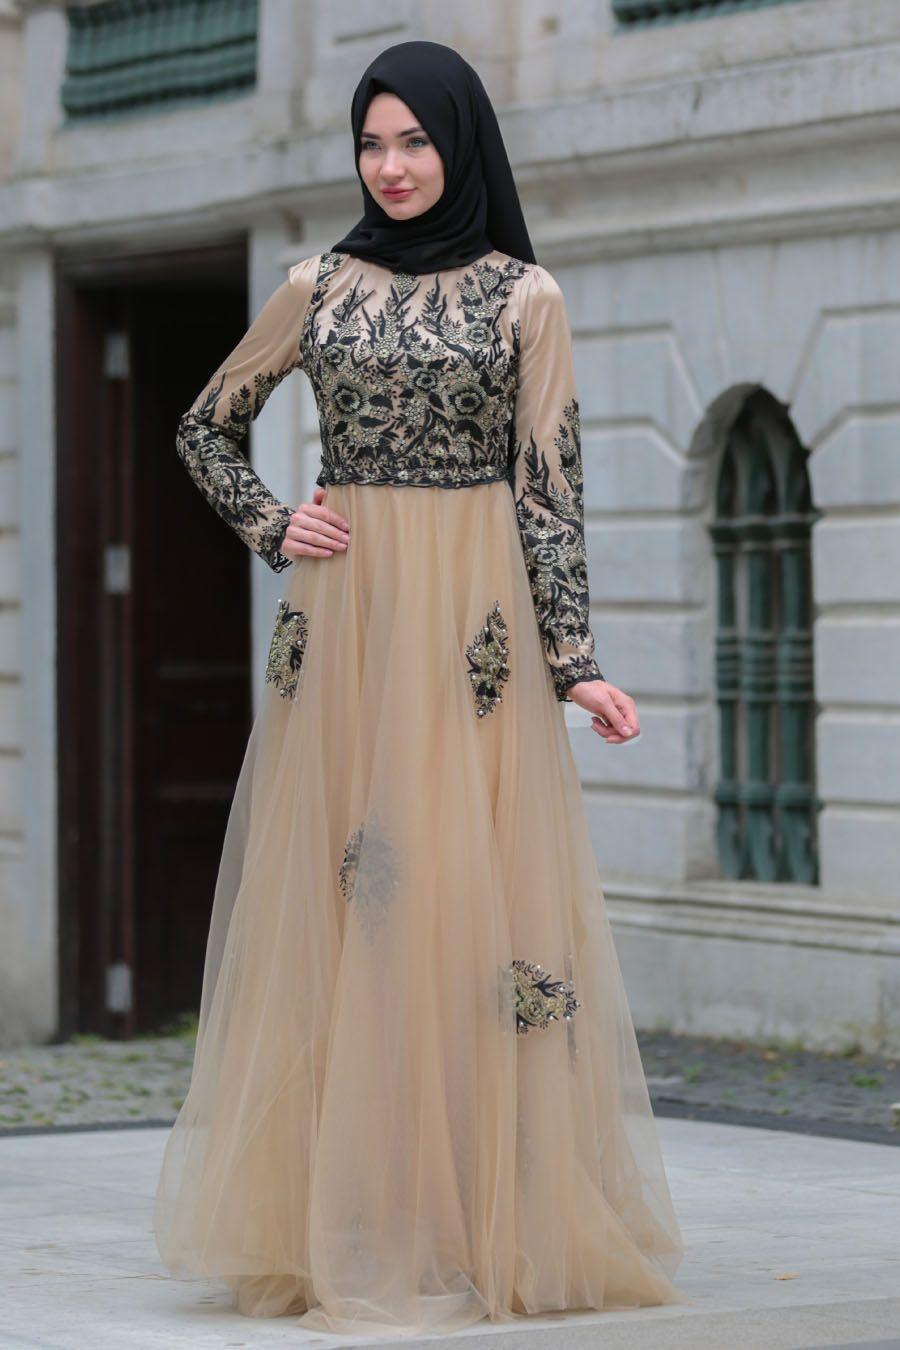 2018 Tesetturlu Soz Abiye Elbise Modelleri Https Www Tesetturelbisesi Com 2018 Tesetturlu Soz A Muslimah Fashion Outfits Muslim Women Fashion Islamic Dress